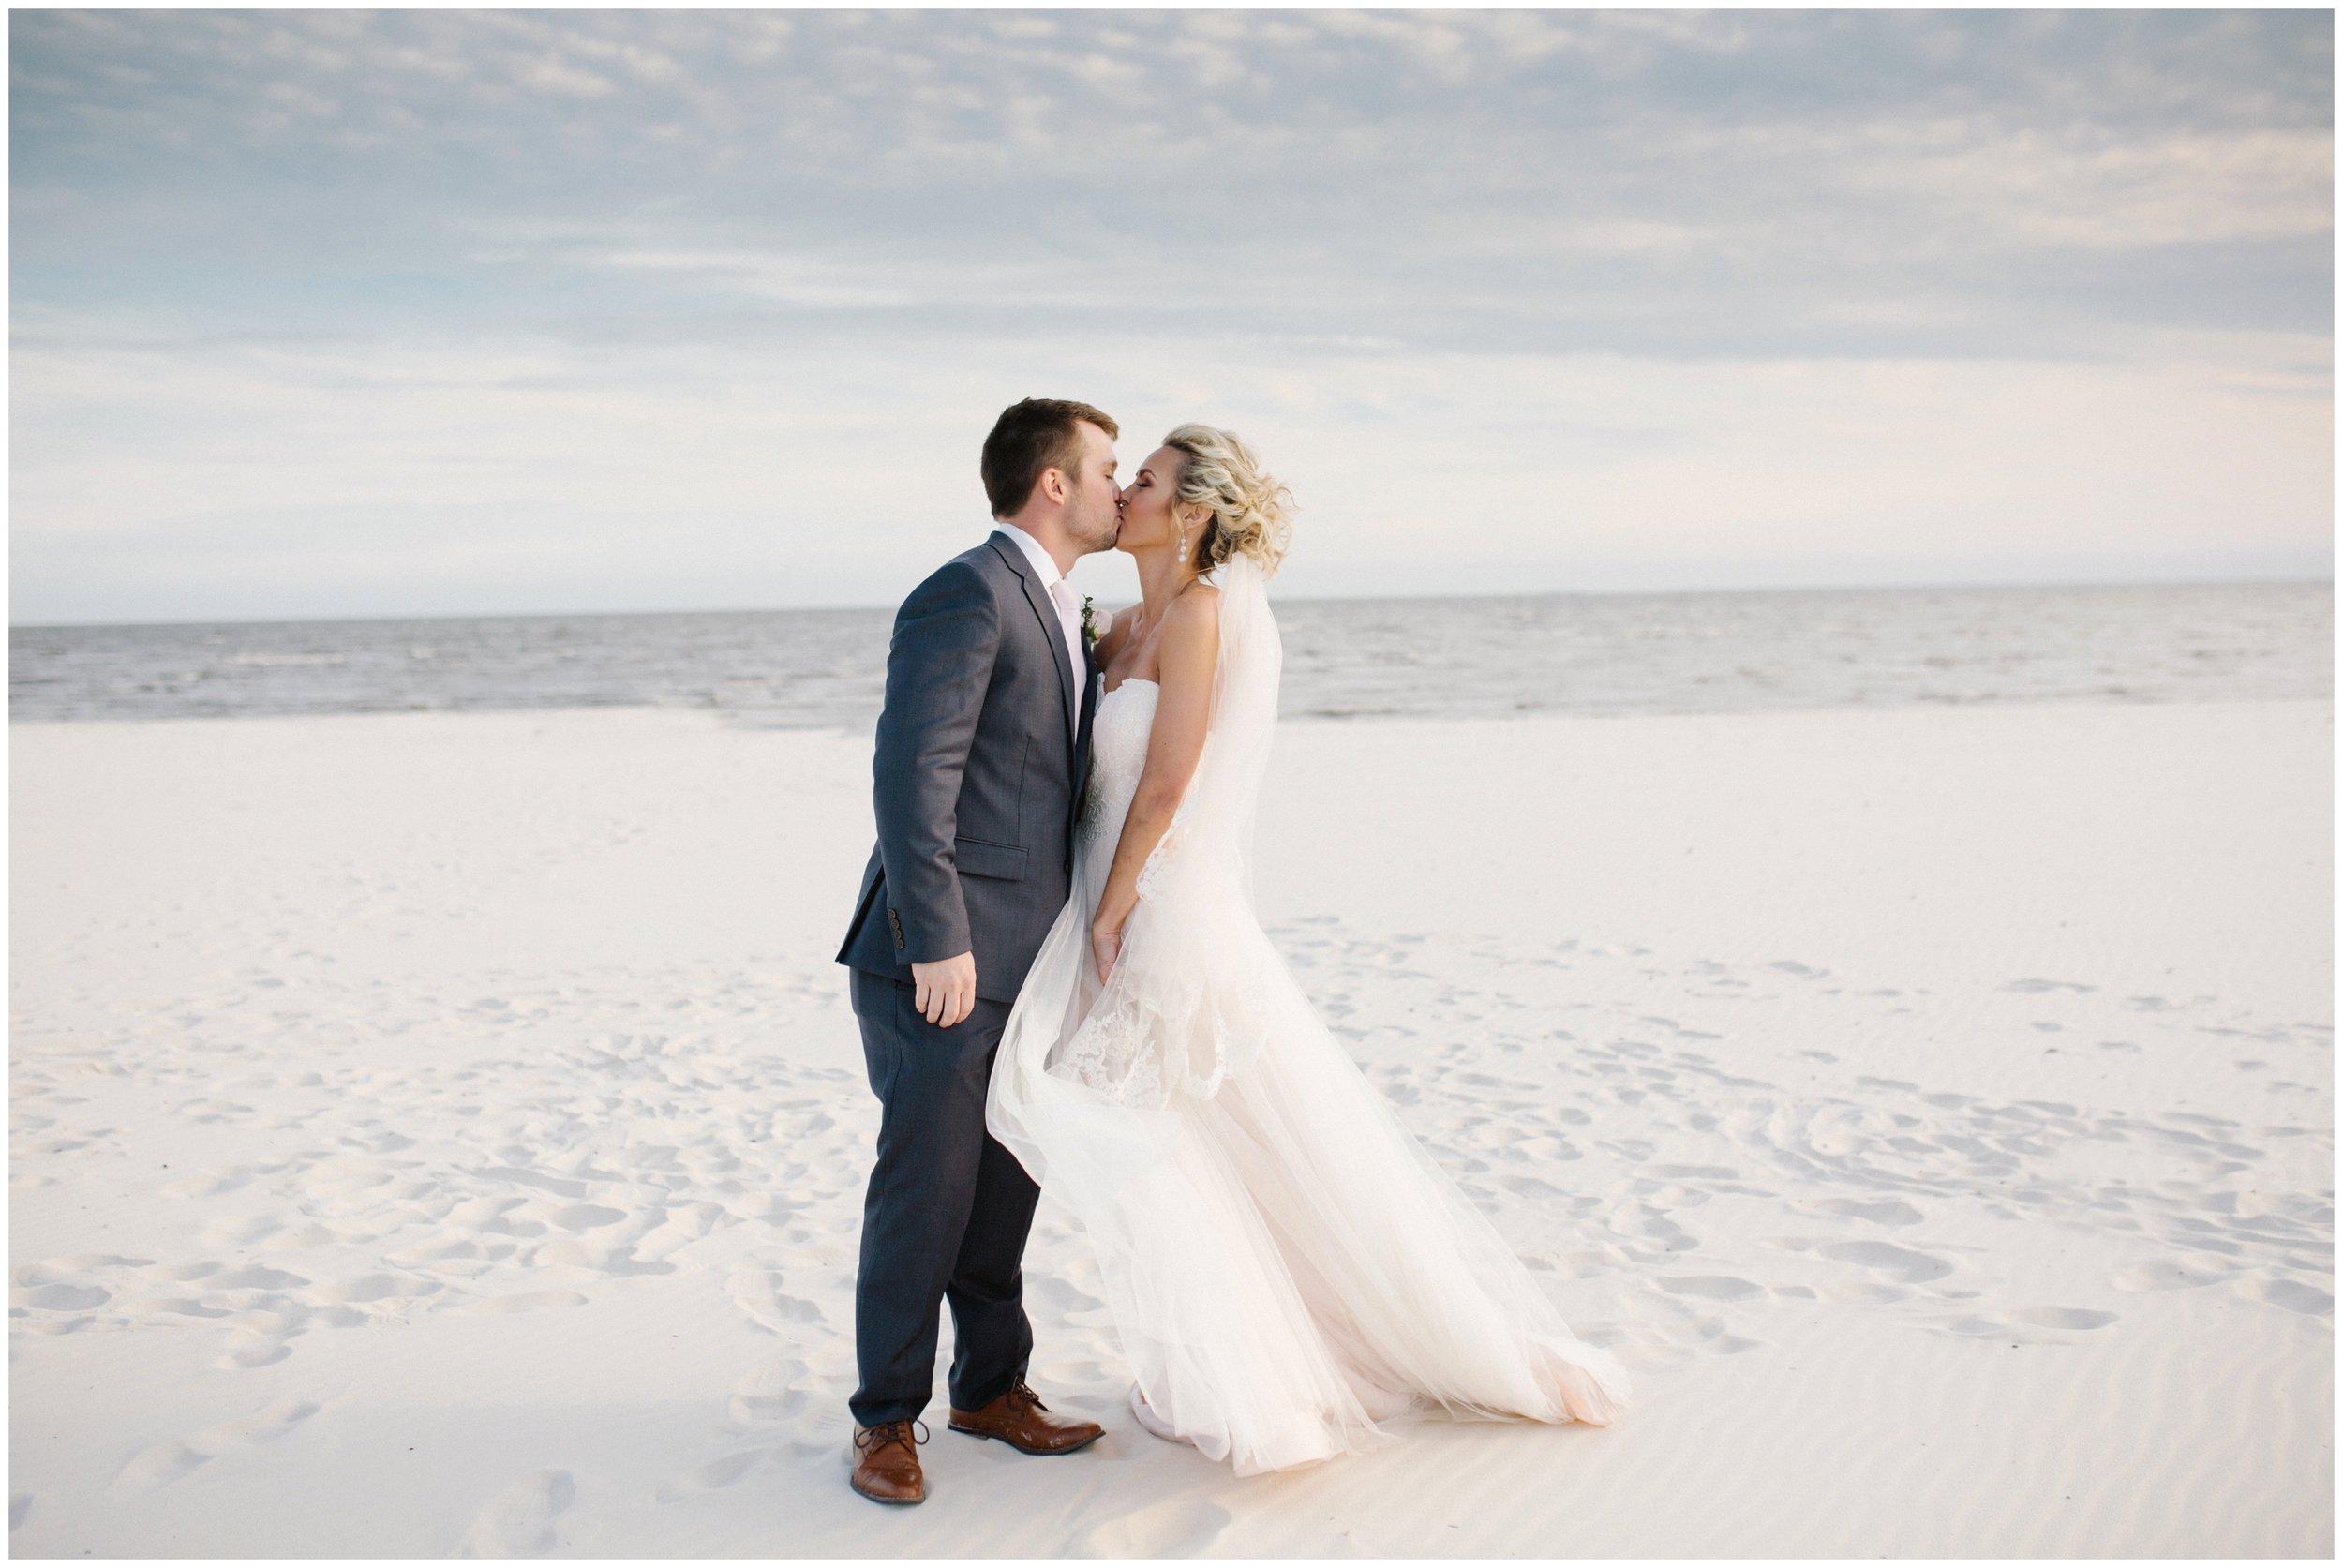 Gulf_Coast_Wedding_Photographer_0054.jpg